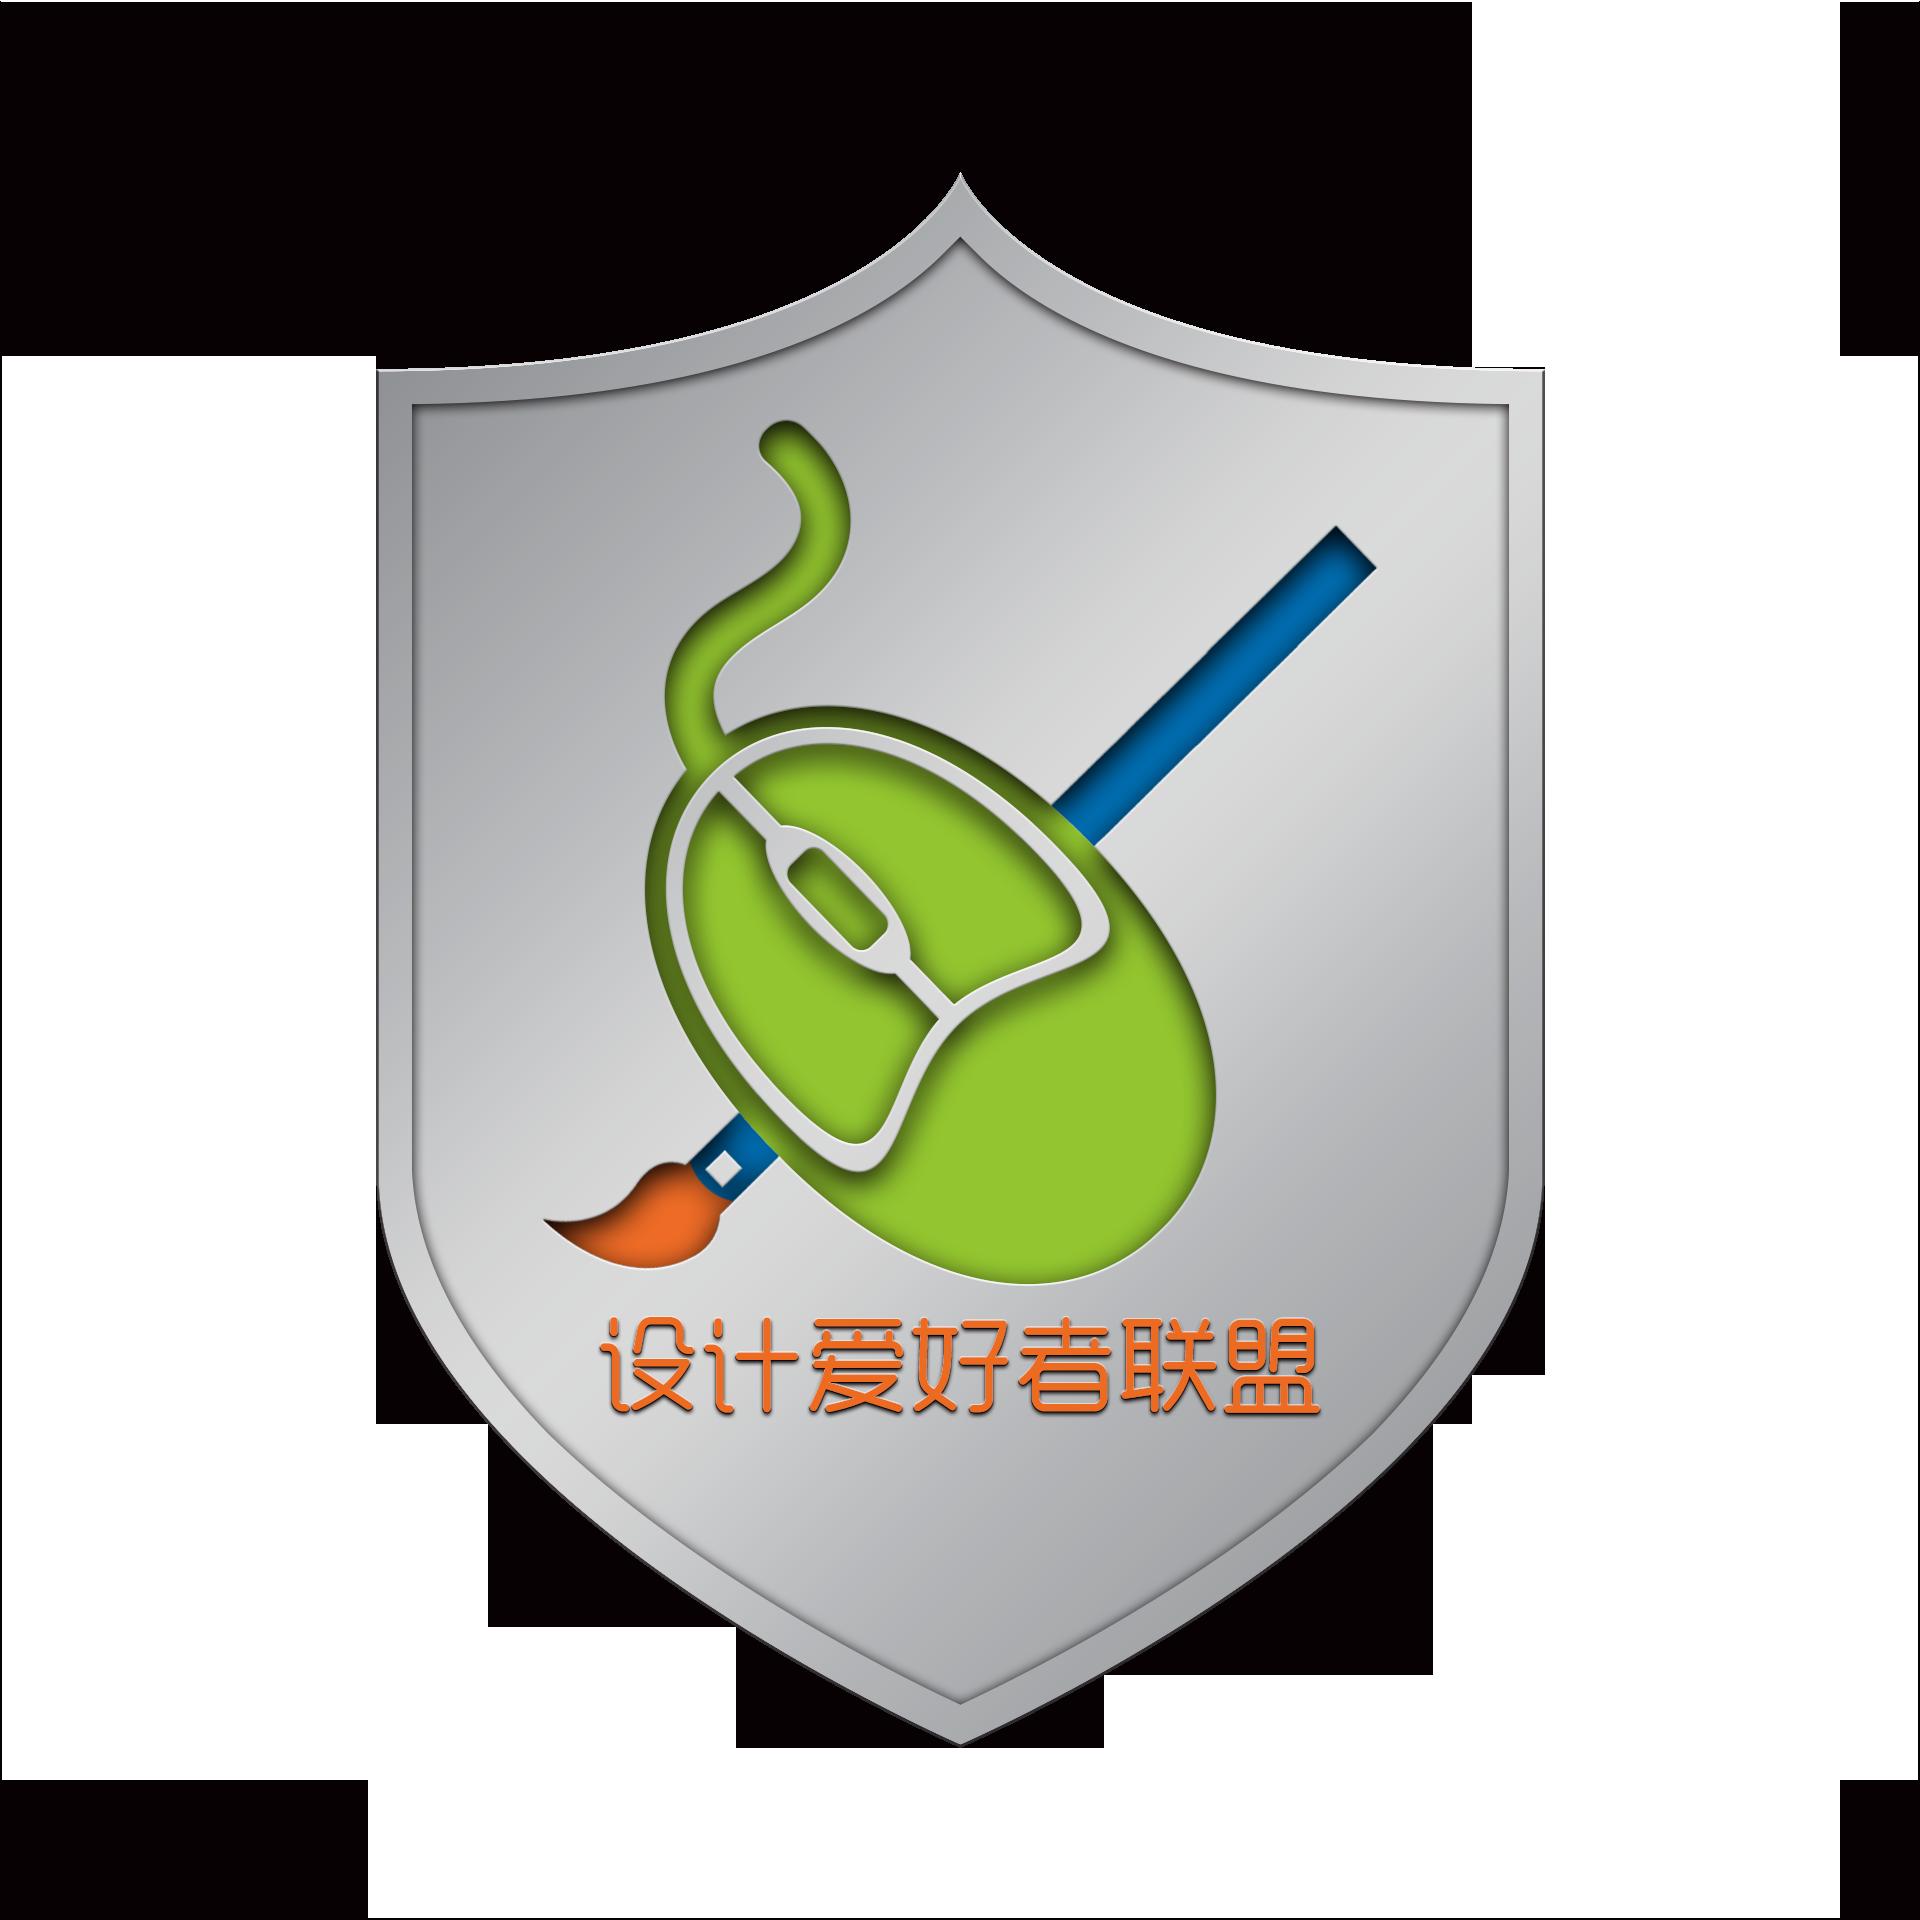 设计爱好者联盟logo2.png